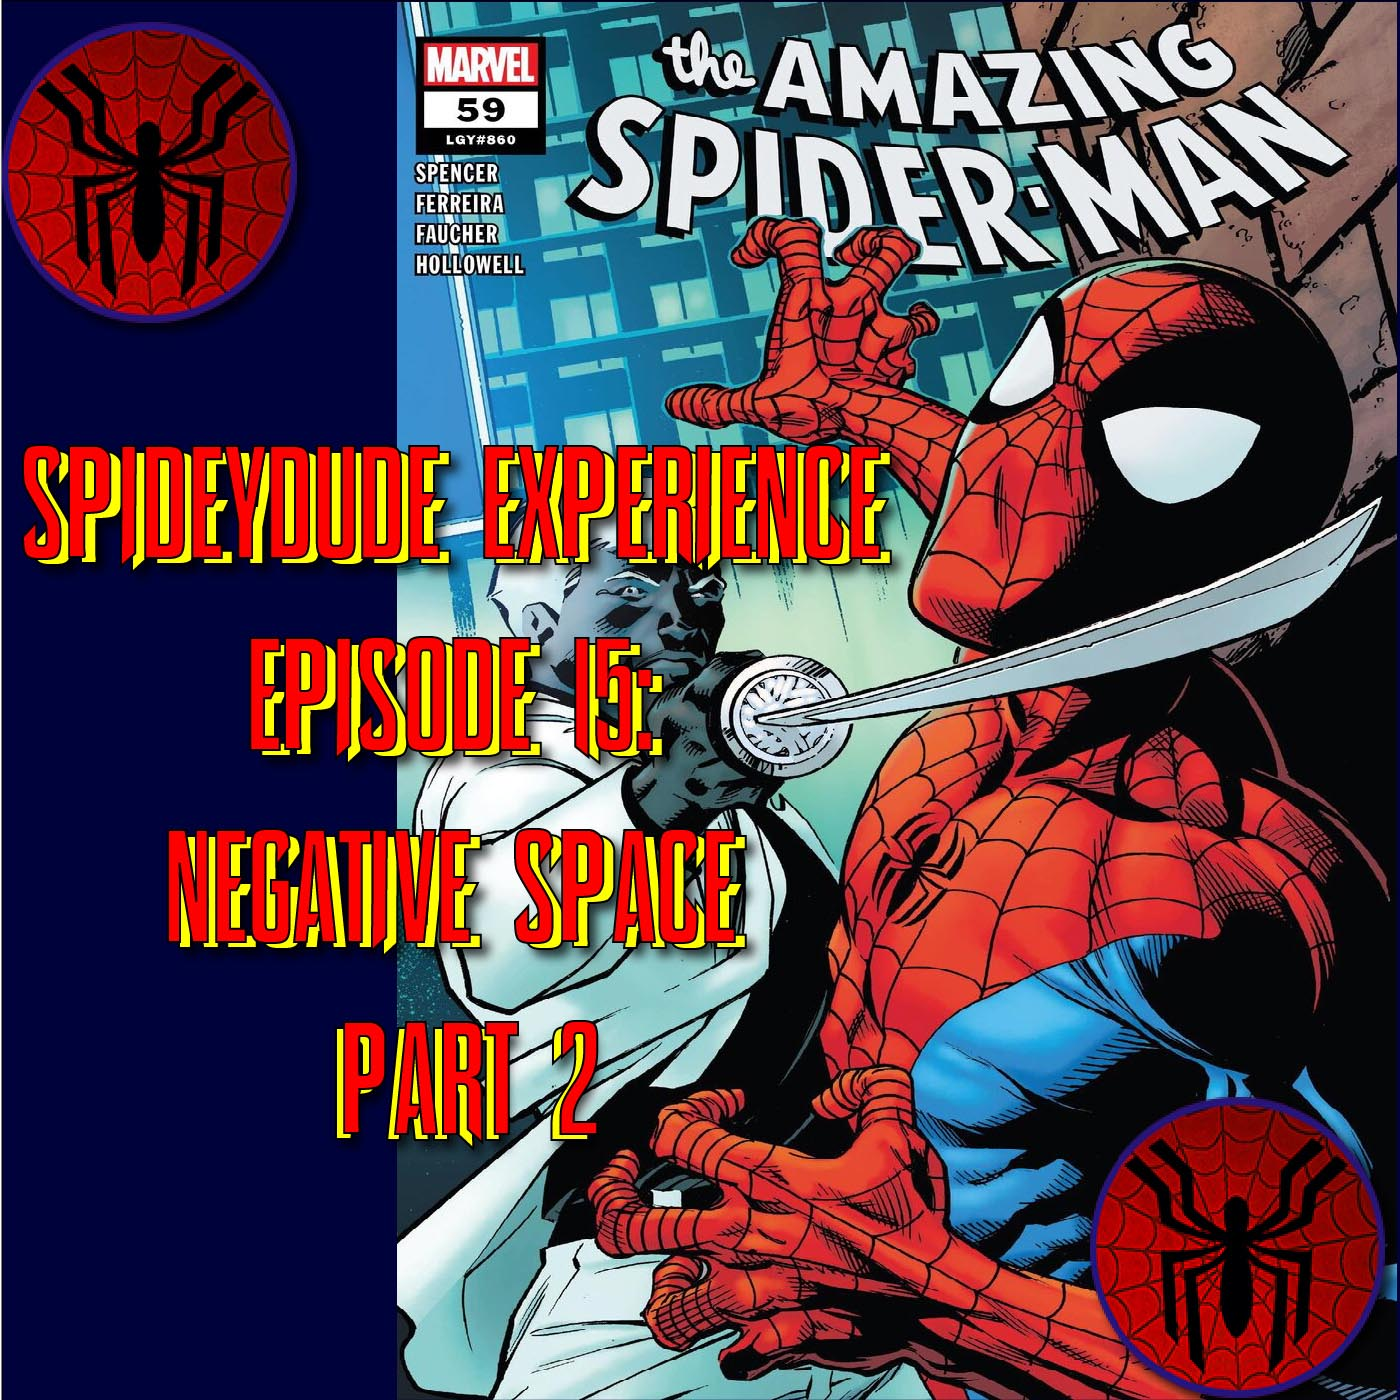 Spideydude Experience Episode 15: Negative Space Part 2 (ASM 860)